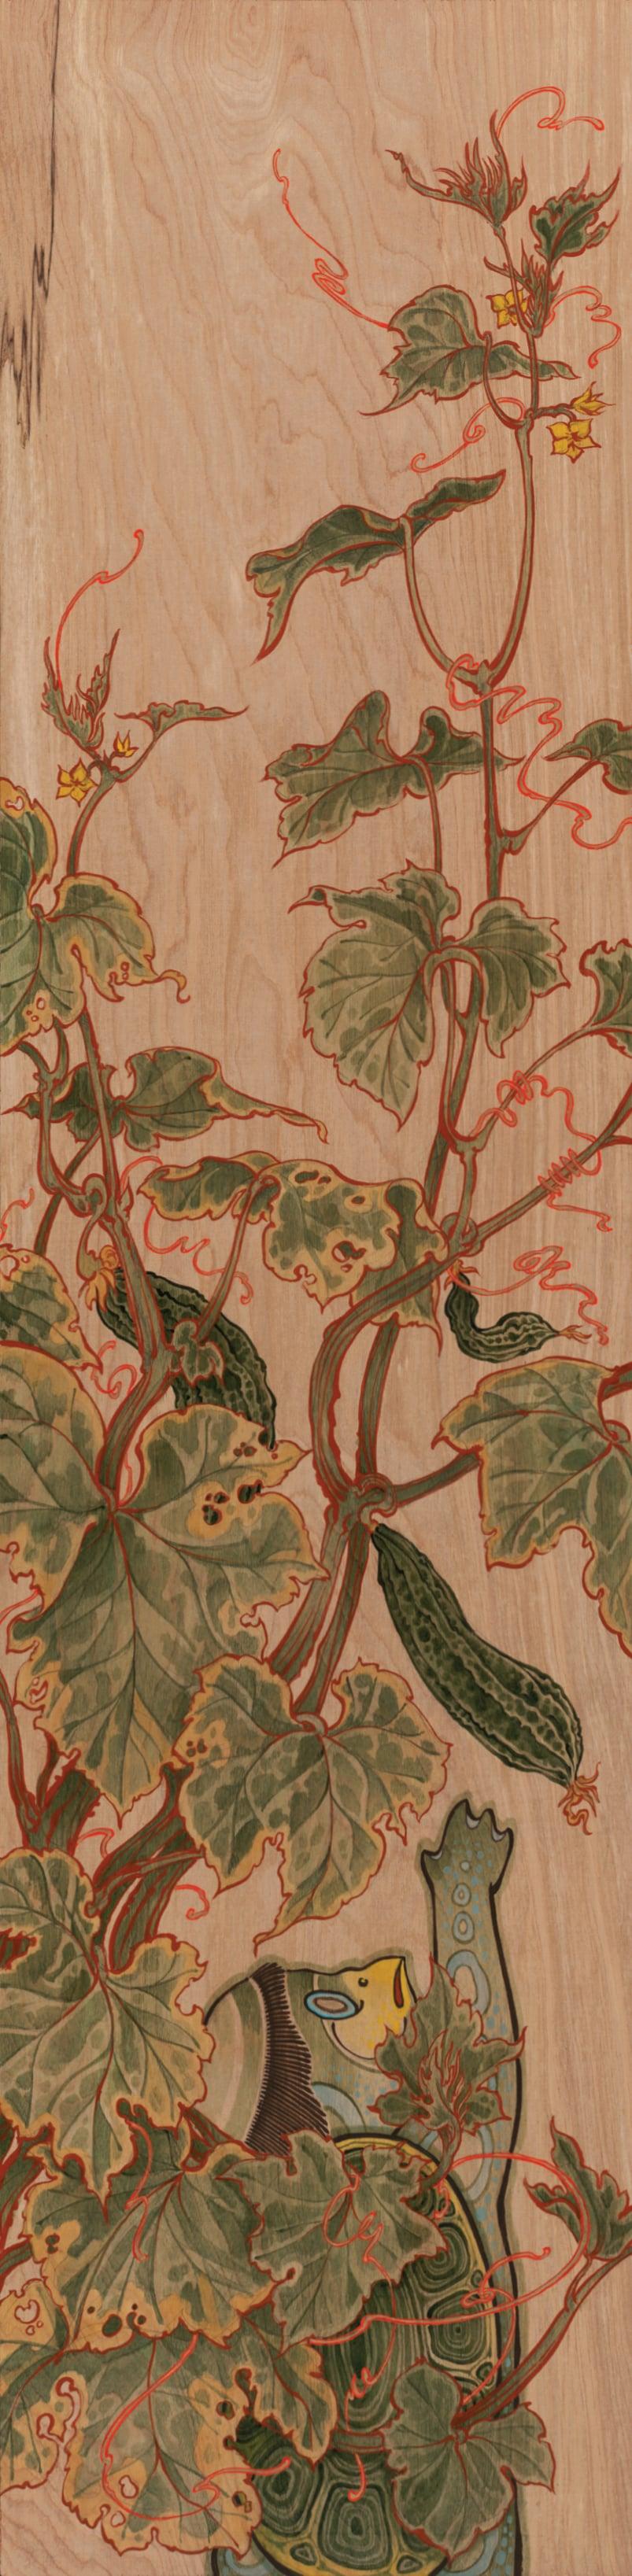 Kappa In My Garden . 2014 - acrylic on wood. 4' x 1'.